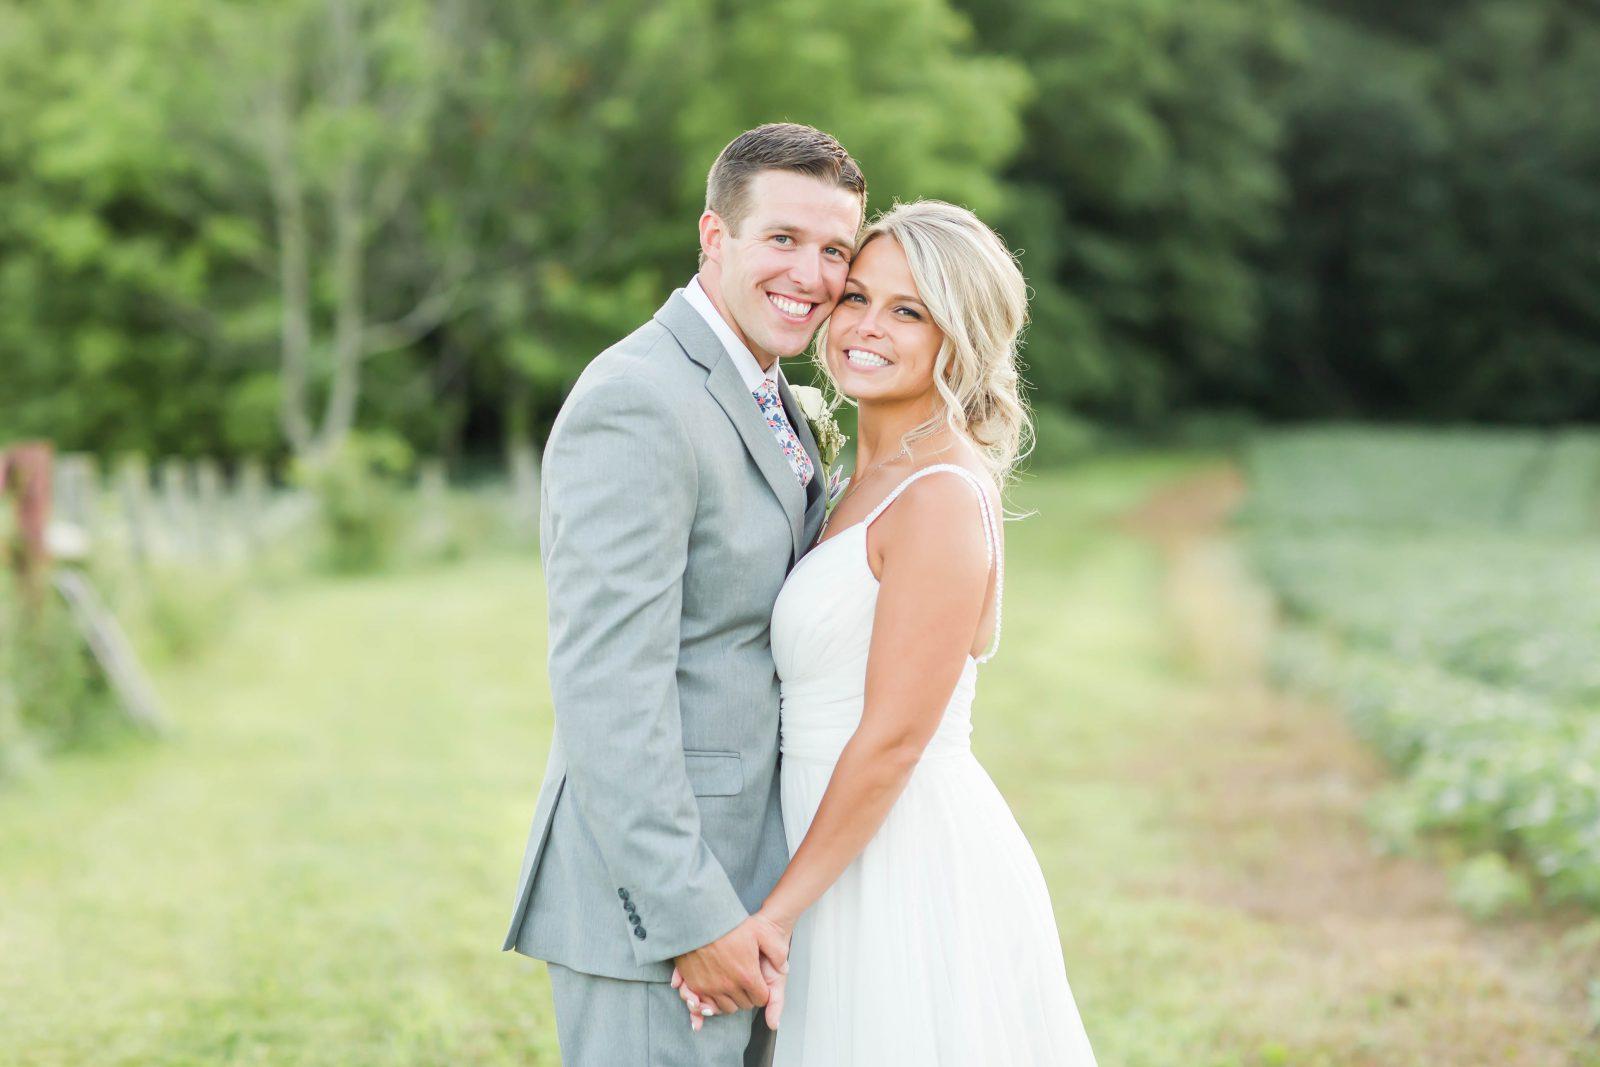 peacock-ridge-summer-wedding-photographer-akron-ohio-loren-jackson-photography-122